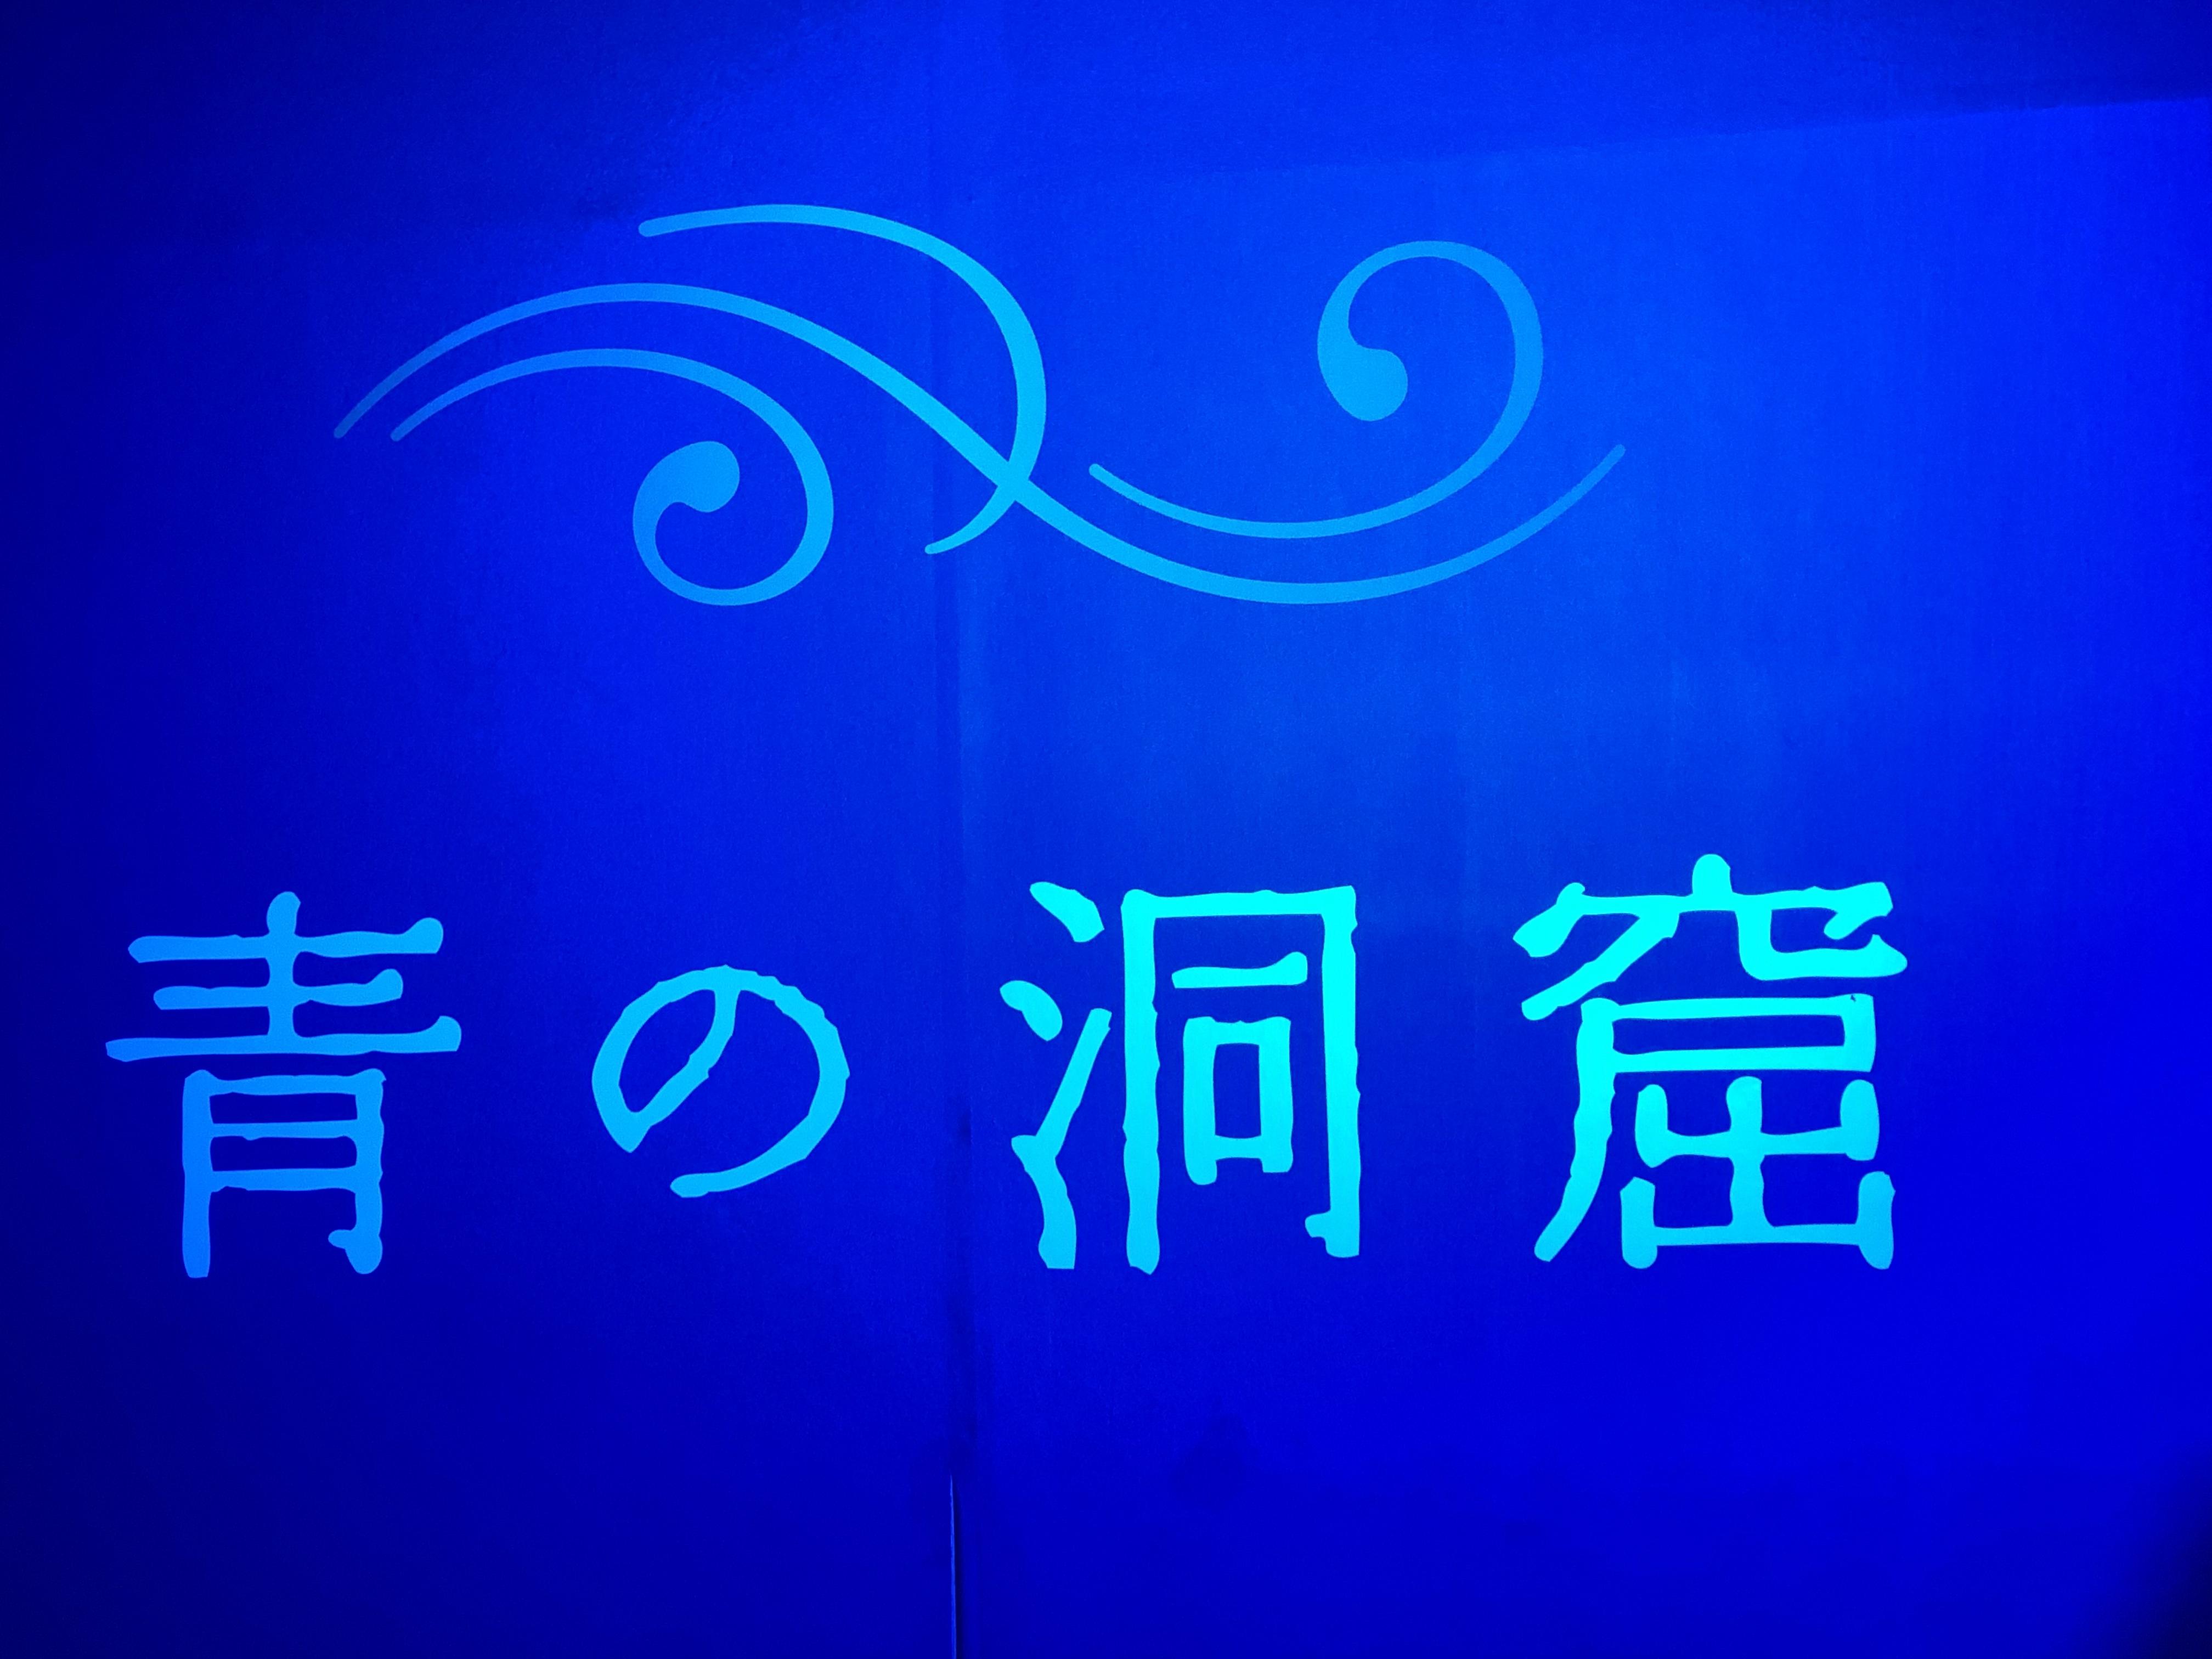 SHIBUYA 青の洞窟